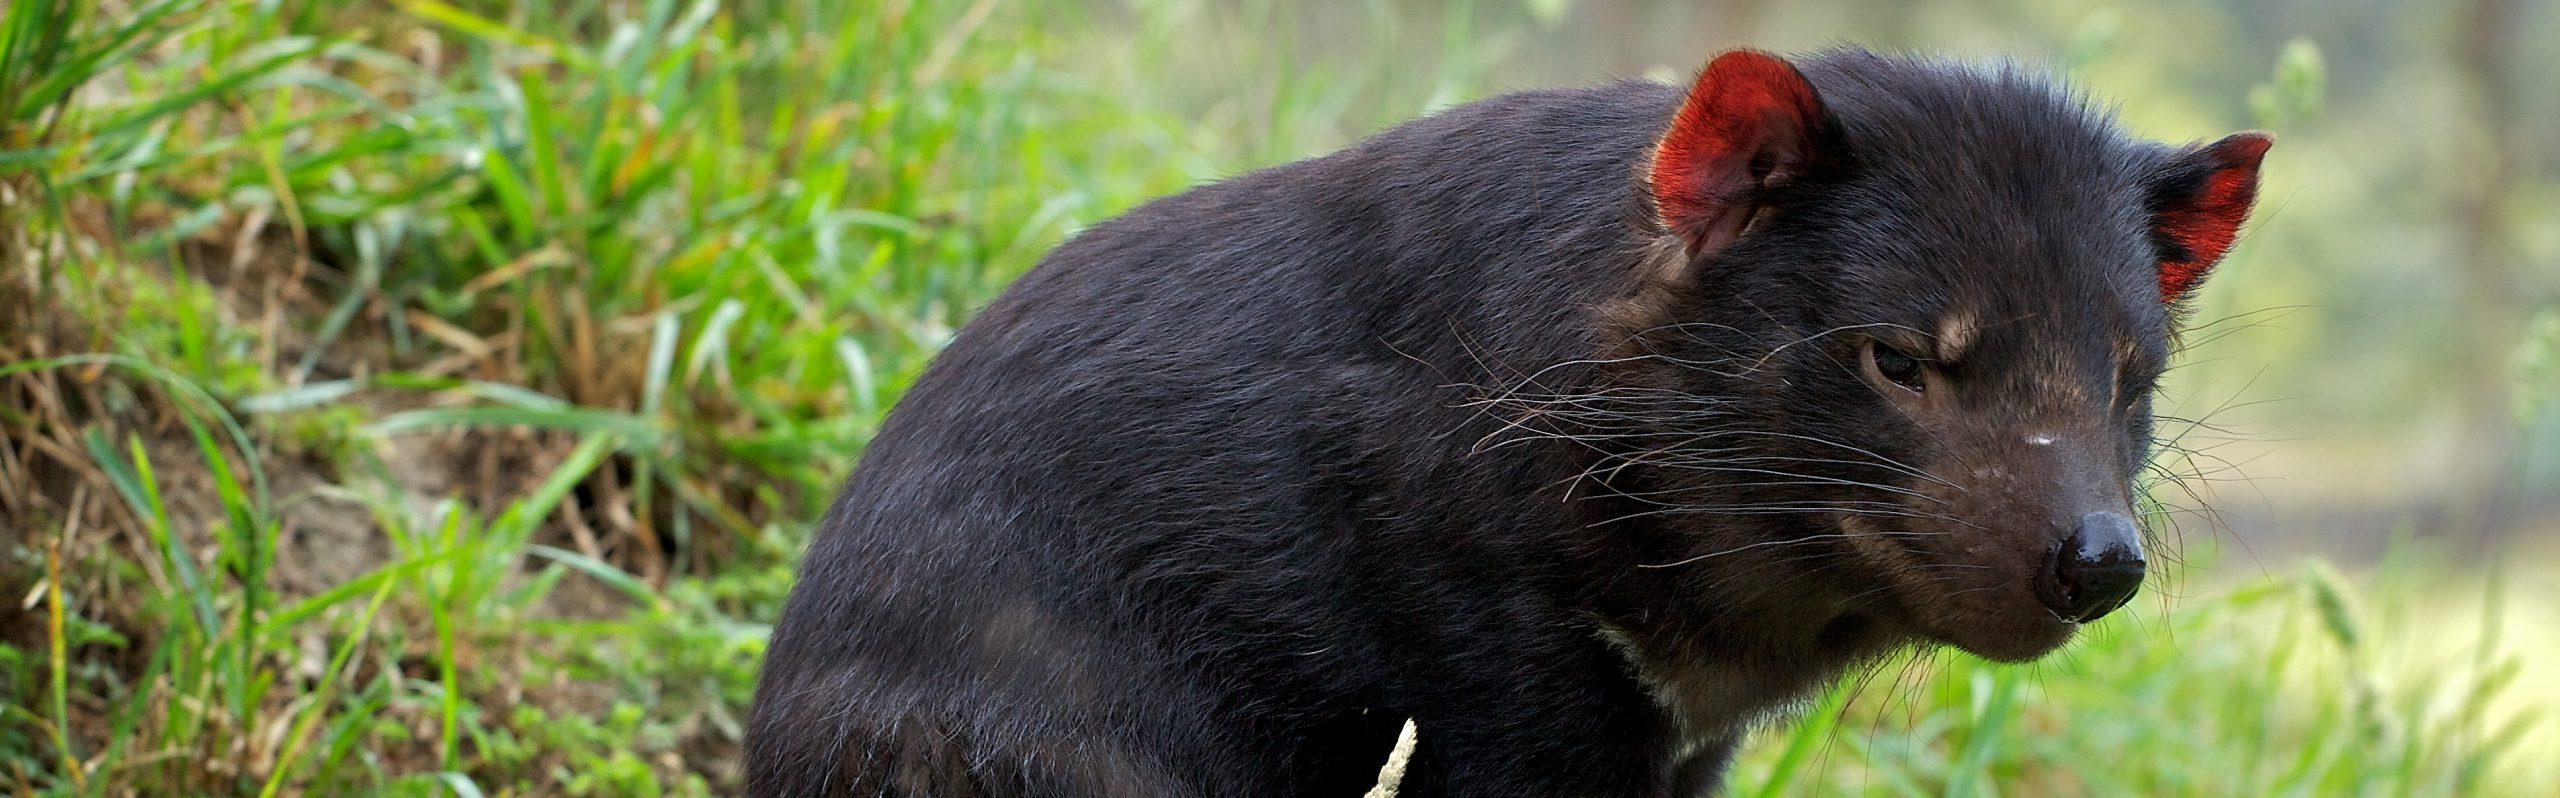 https://faunafocus.com/home/january-2019-tasmanian-devil/#jp-carousel-12985